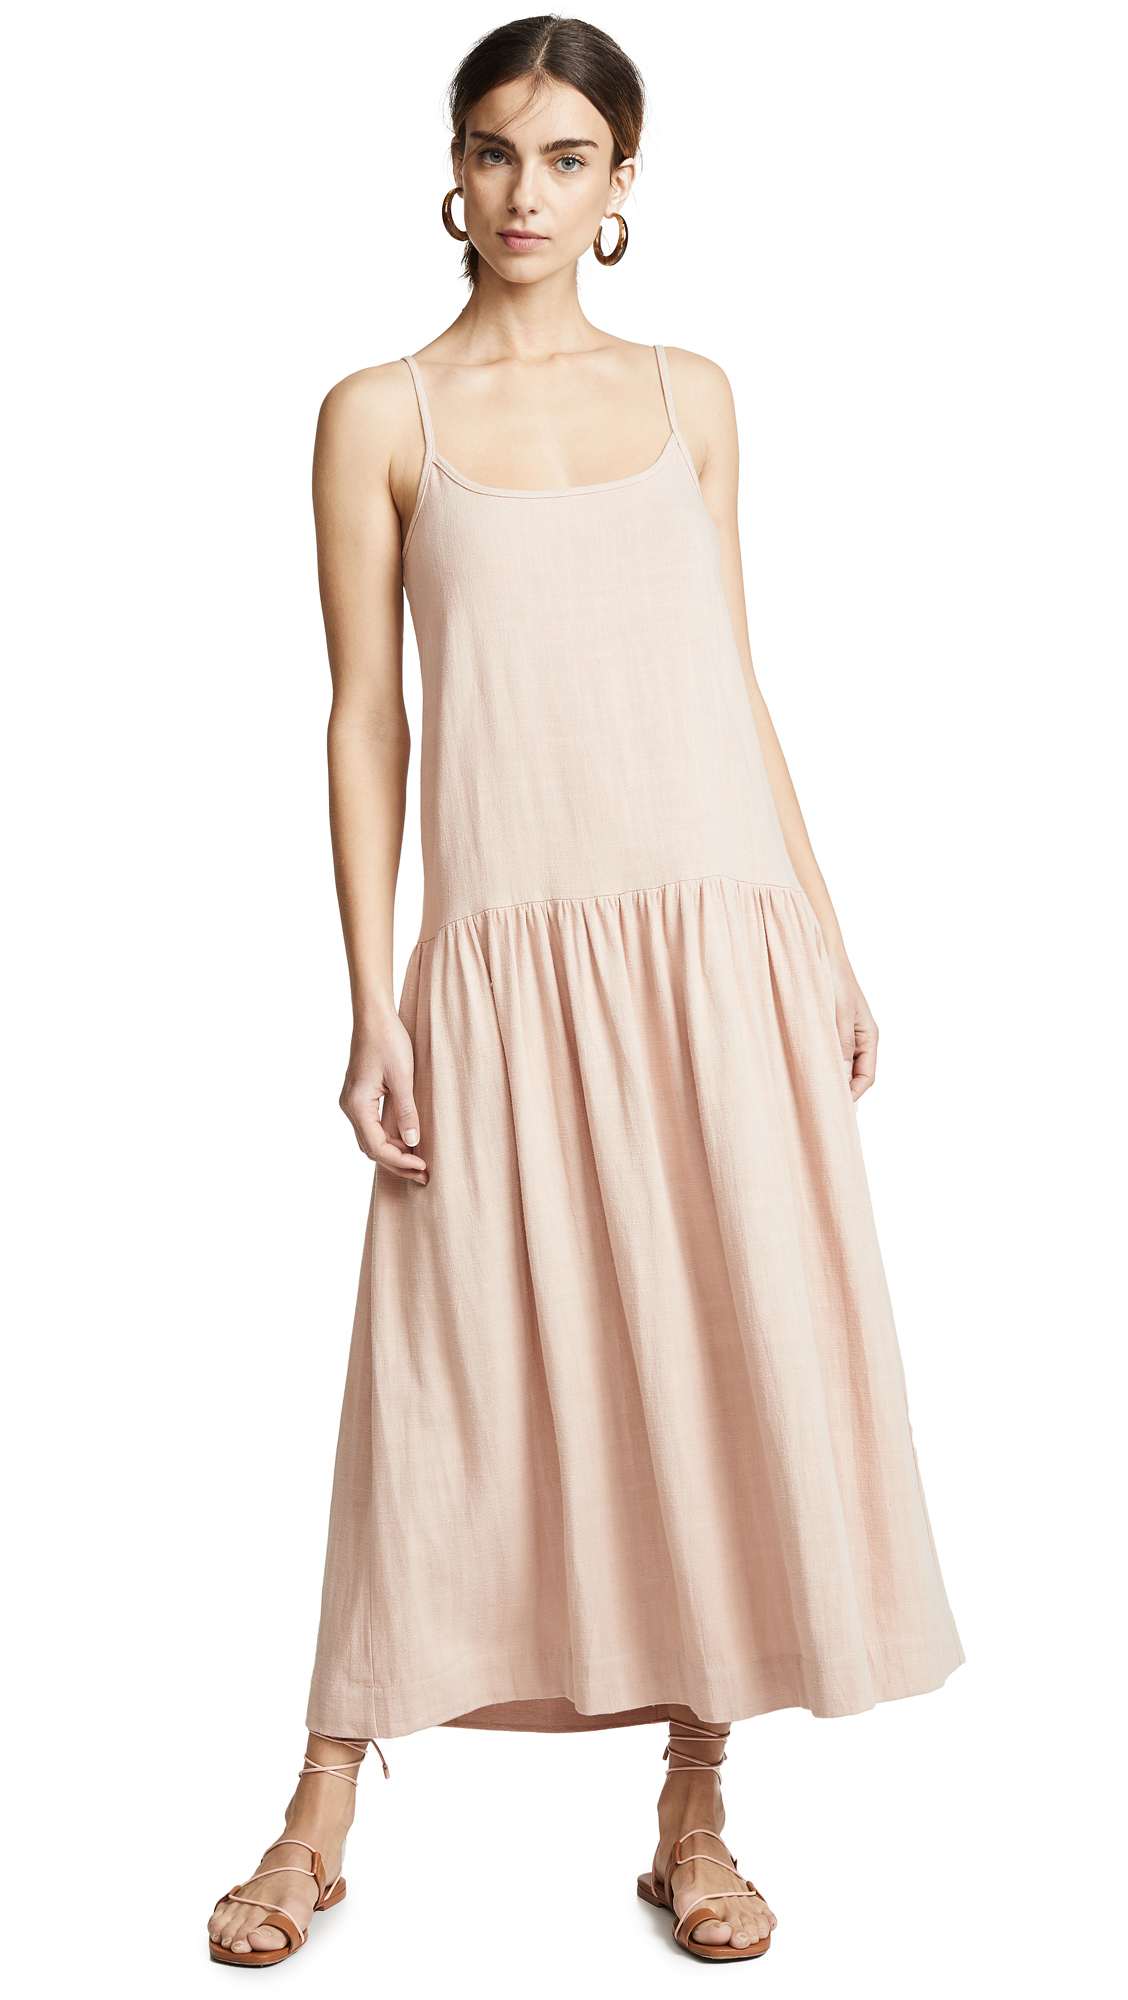 Rachel Pally Willis Dress - Sand